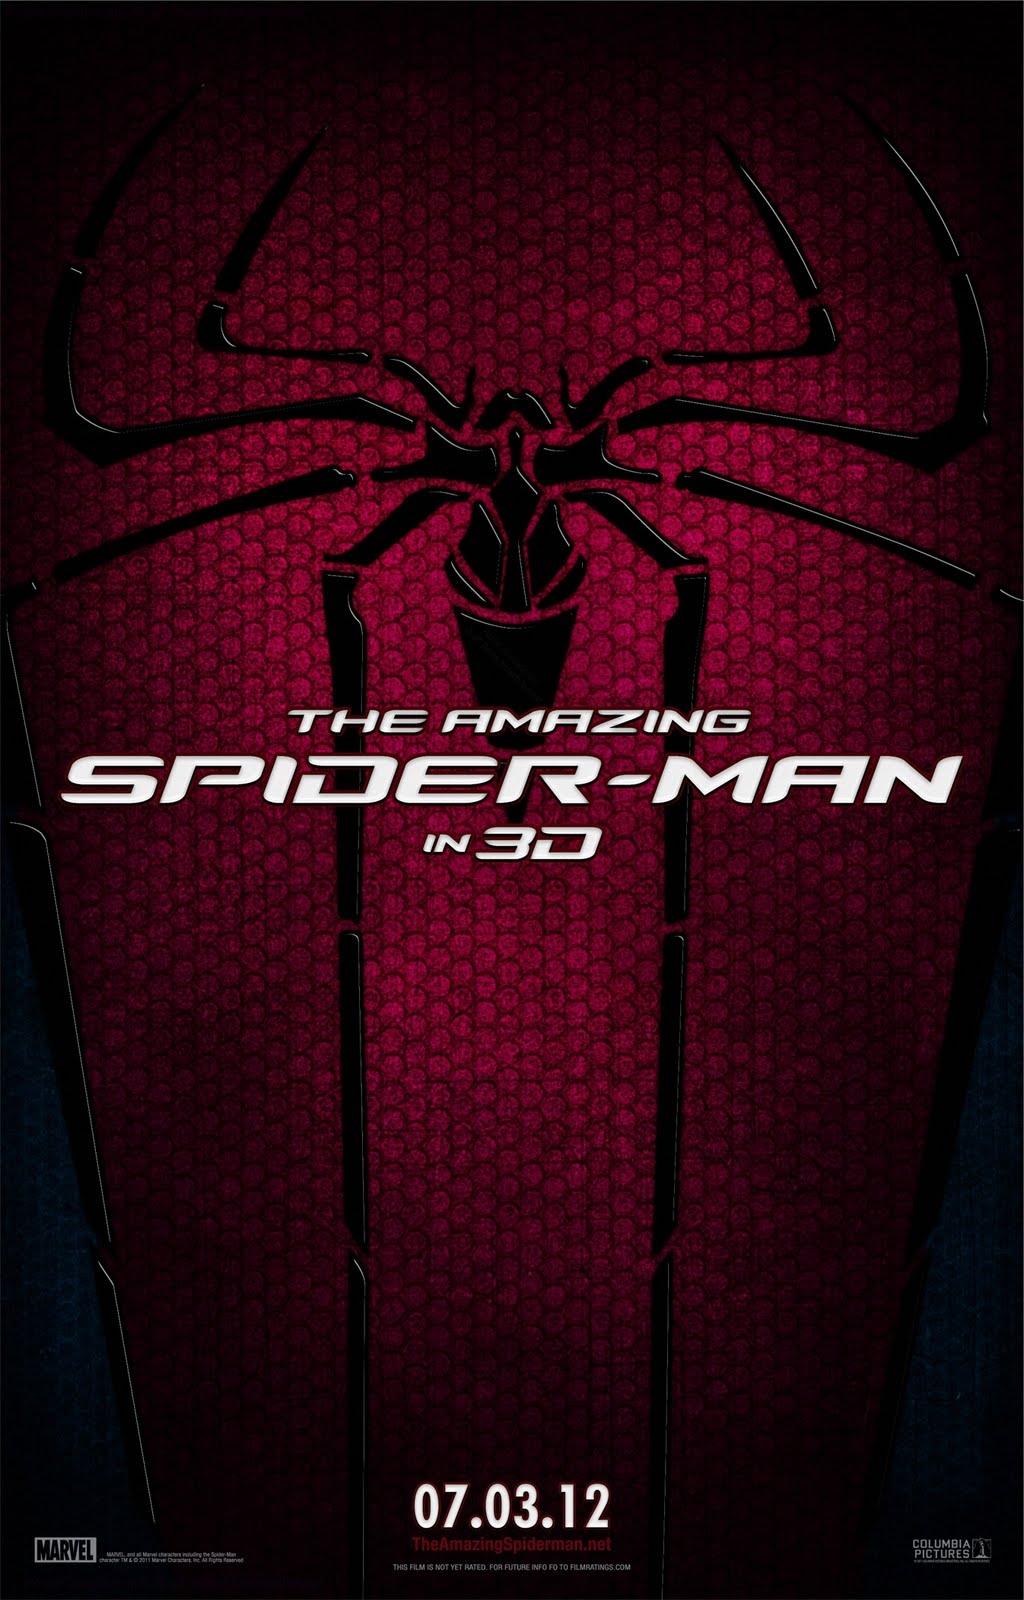 http://3.bp.blogspot.com/-Gq1Y1siELWg/TwWWYaF7Z4I/AAAAAAAAA_g/sZls6HK9m08/s1600/amazing+spiderman%255Bfreehqwallpapers.blogspot.com%255D+%25284%2529.jpg